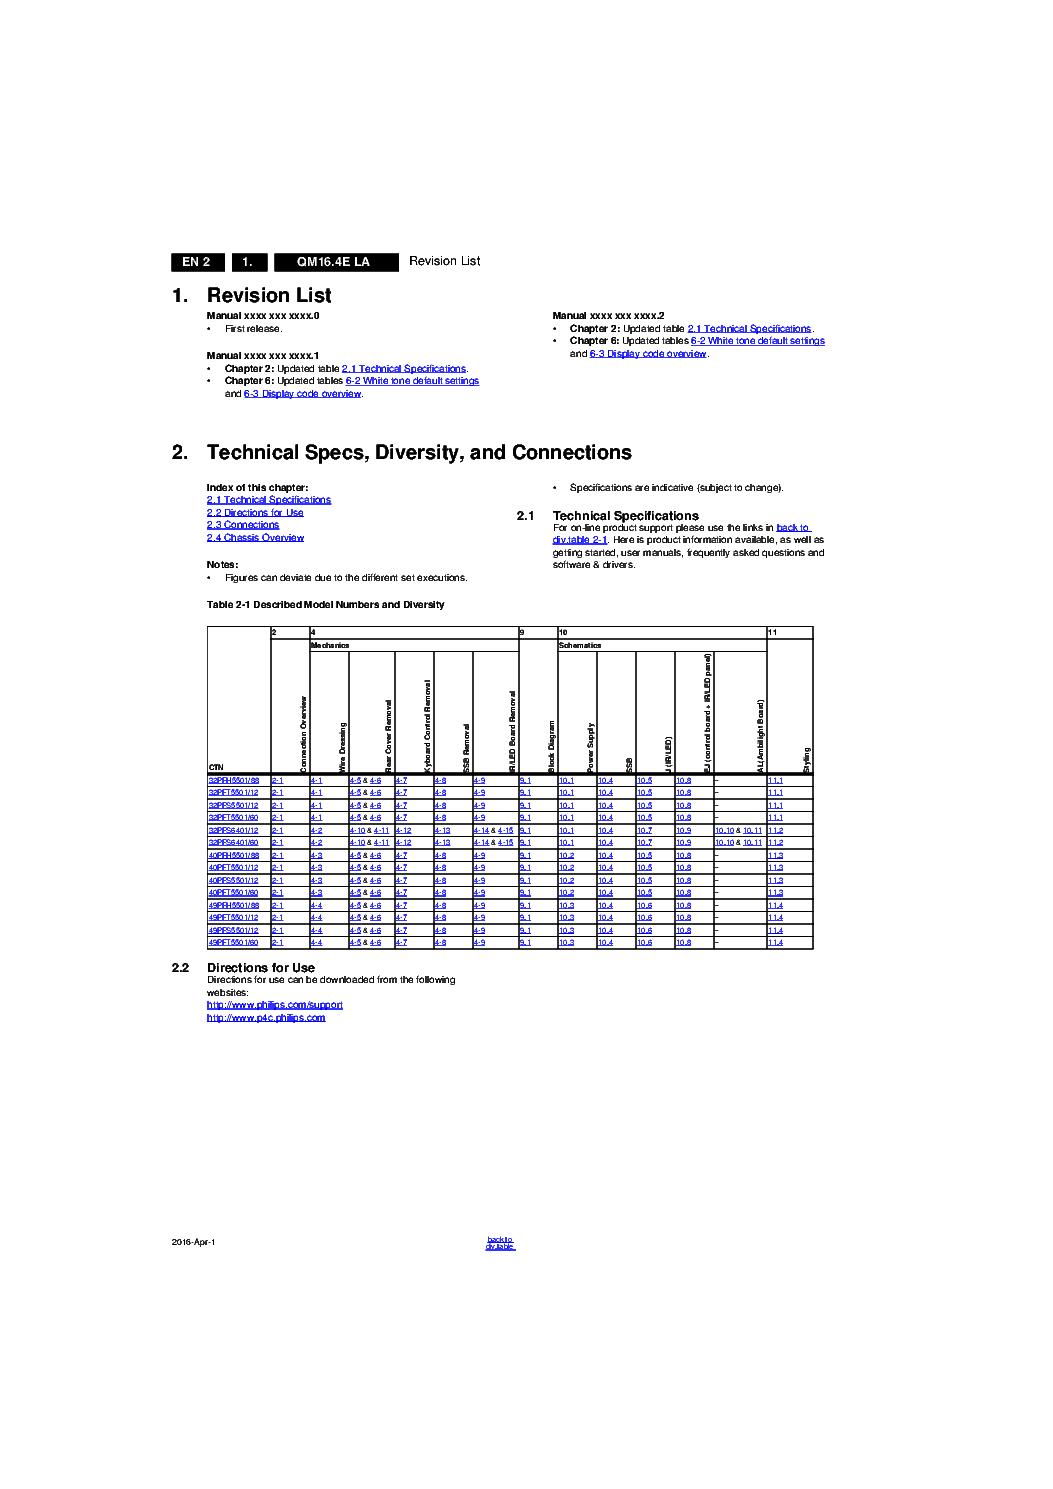 Philips 40pft5501 Chassis Qm16 4e La Sm Service Manual Download  Schematics  Eeprom  Repair Info